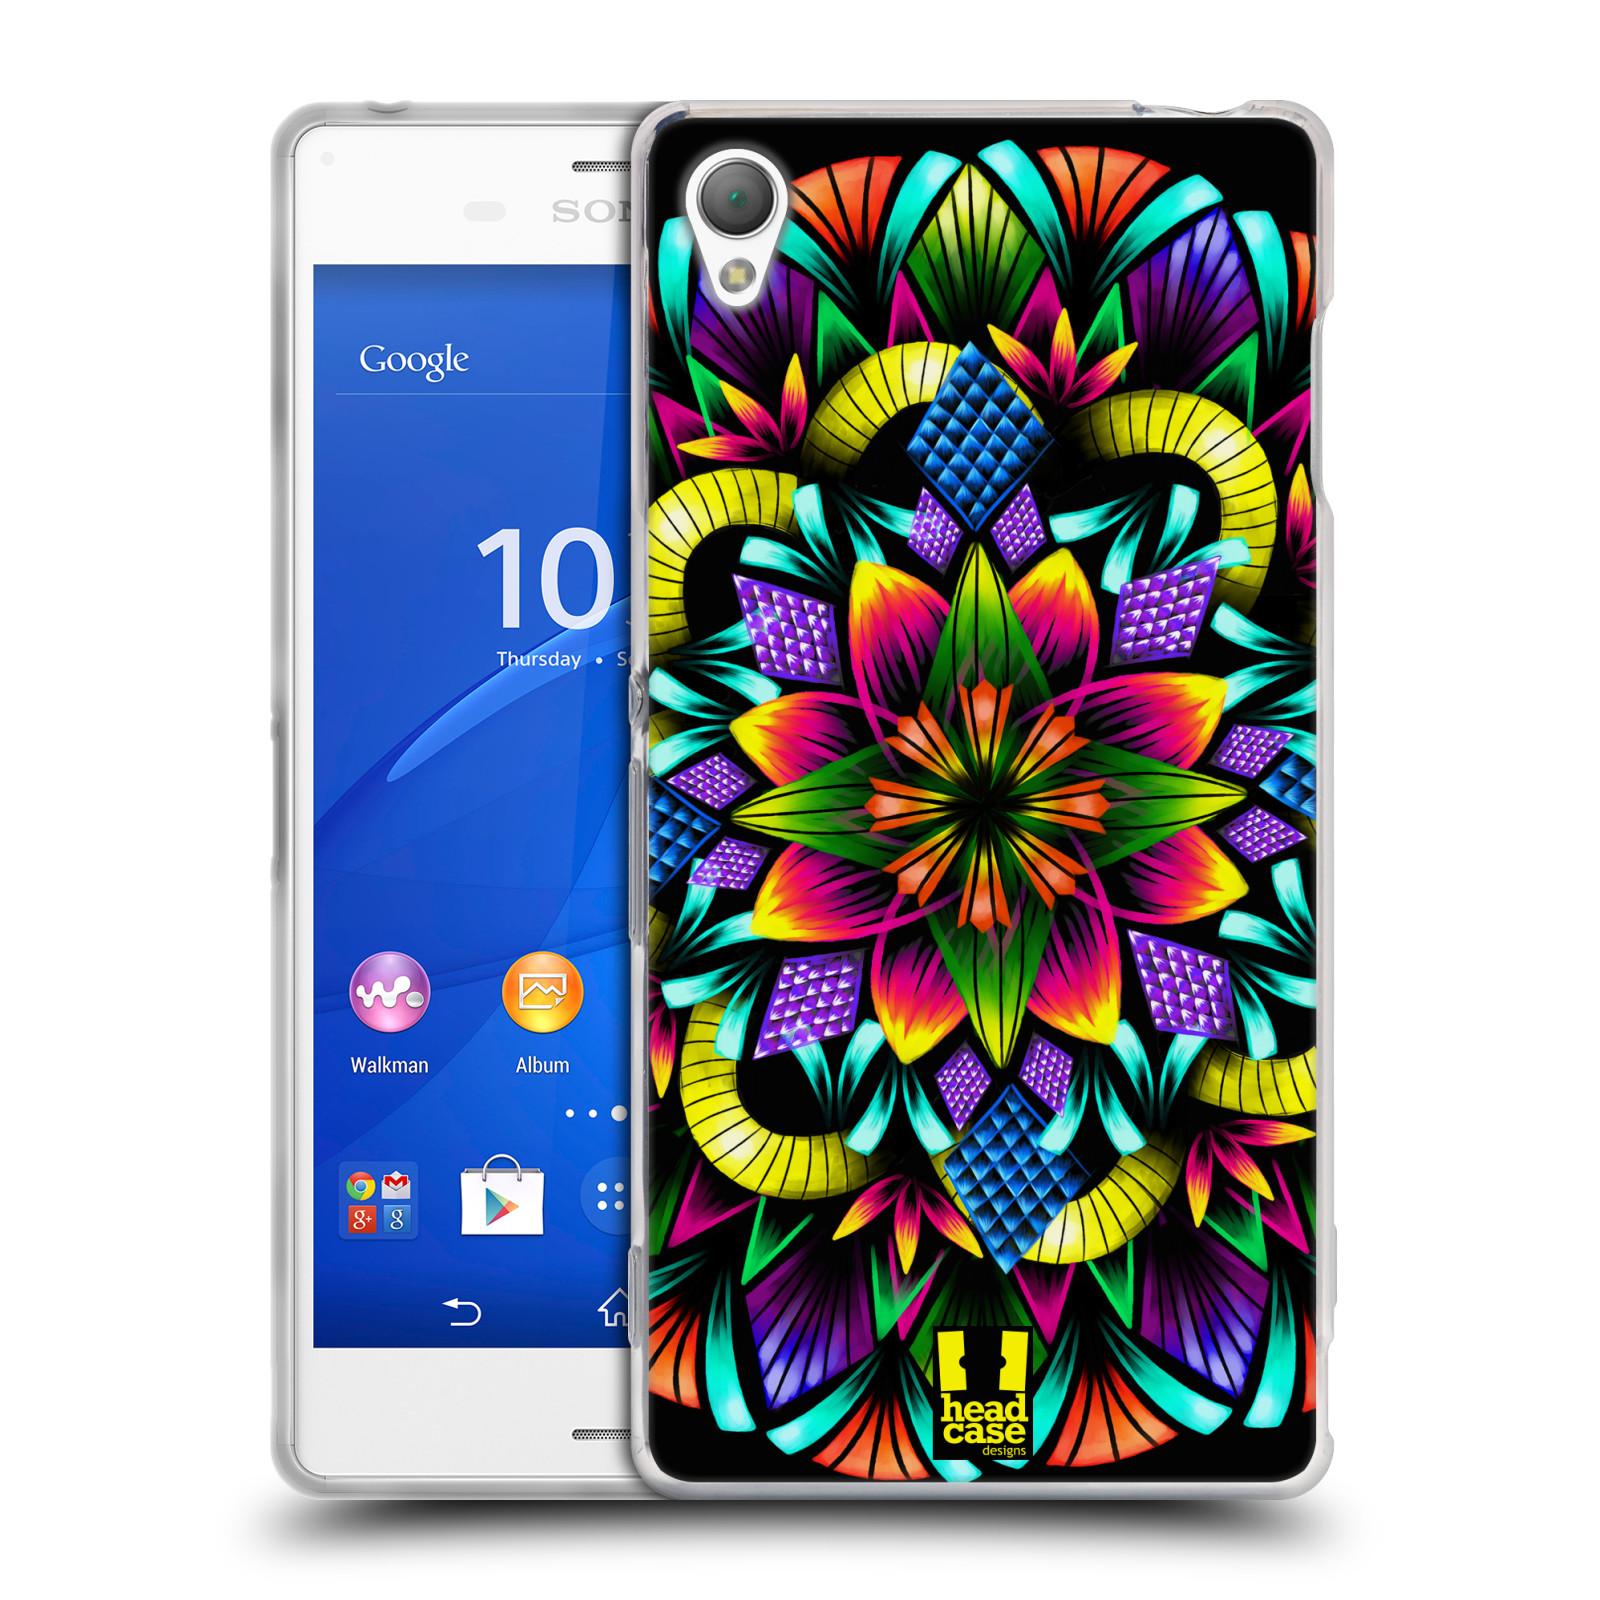 HEAD CASE silikonový obal na mobil Sony Xperia Z3 vzor Indie Mandala kaleidoskop barevný vzor KVĚTINA